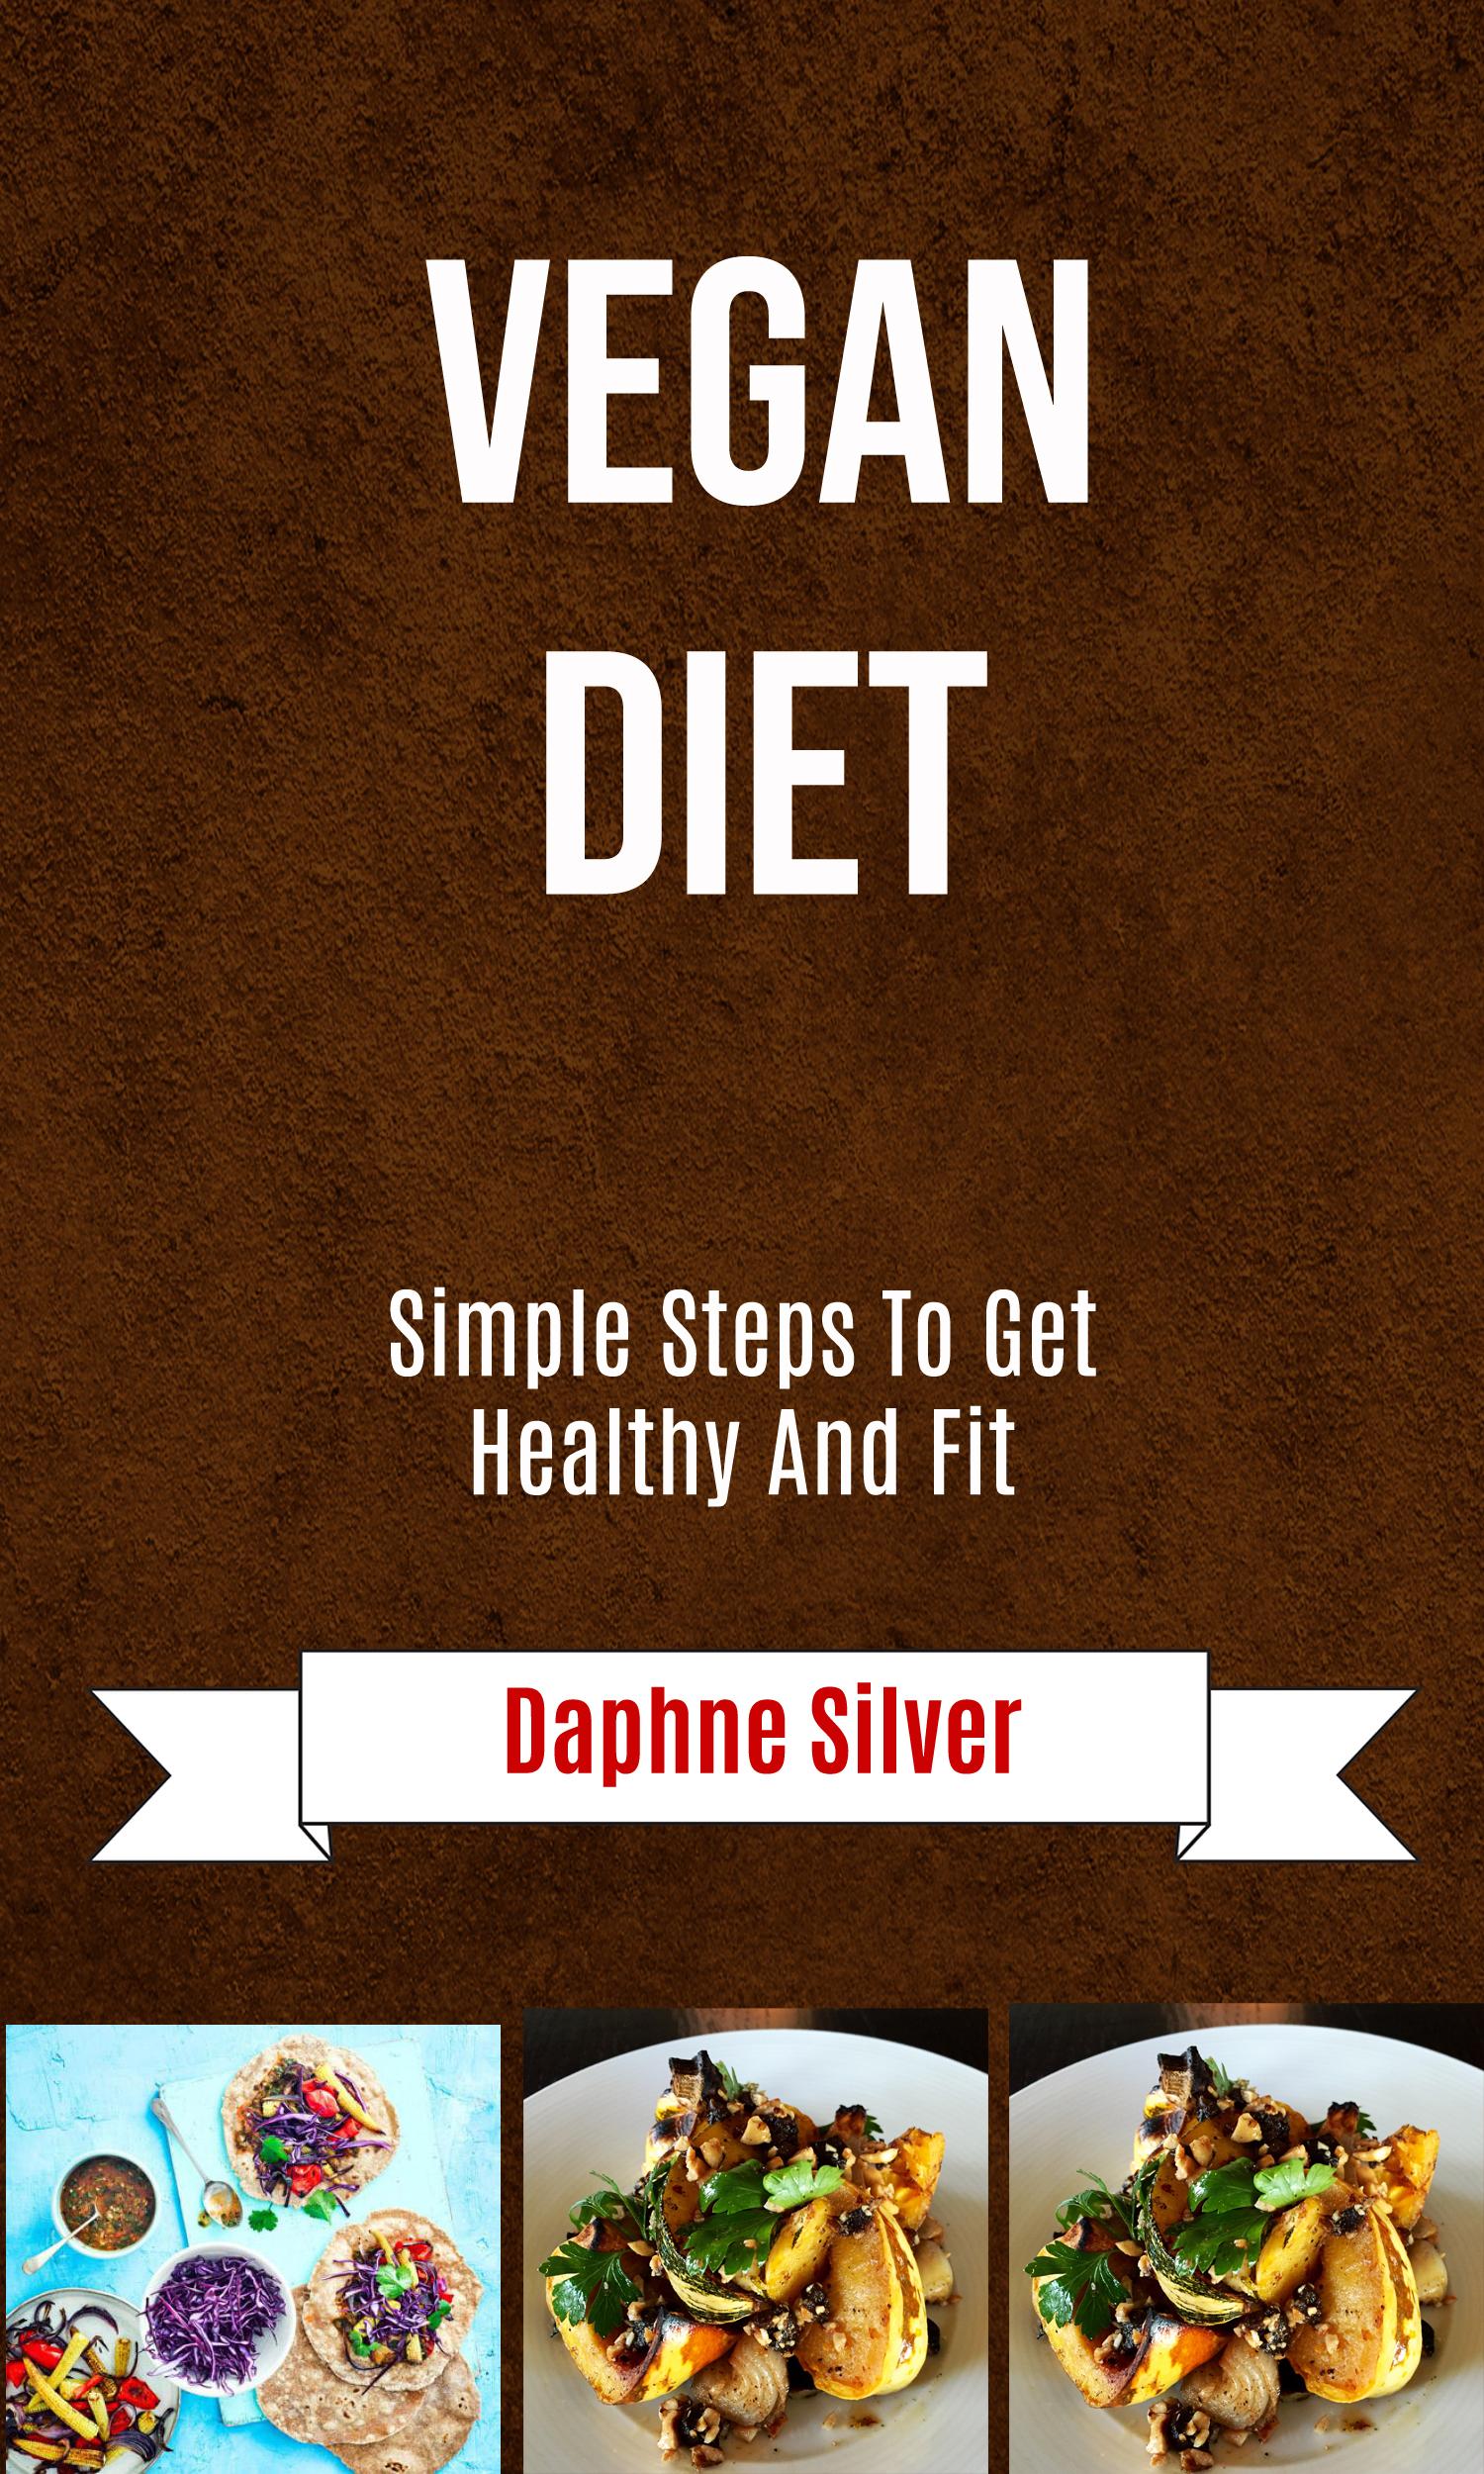 Vegan diet: simple steps to get healthy and fit